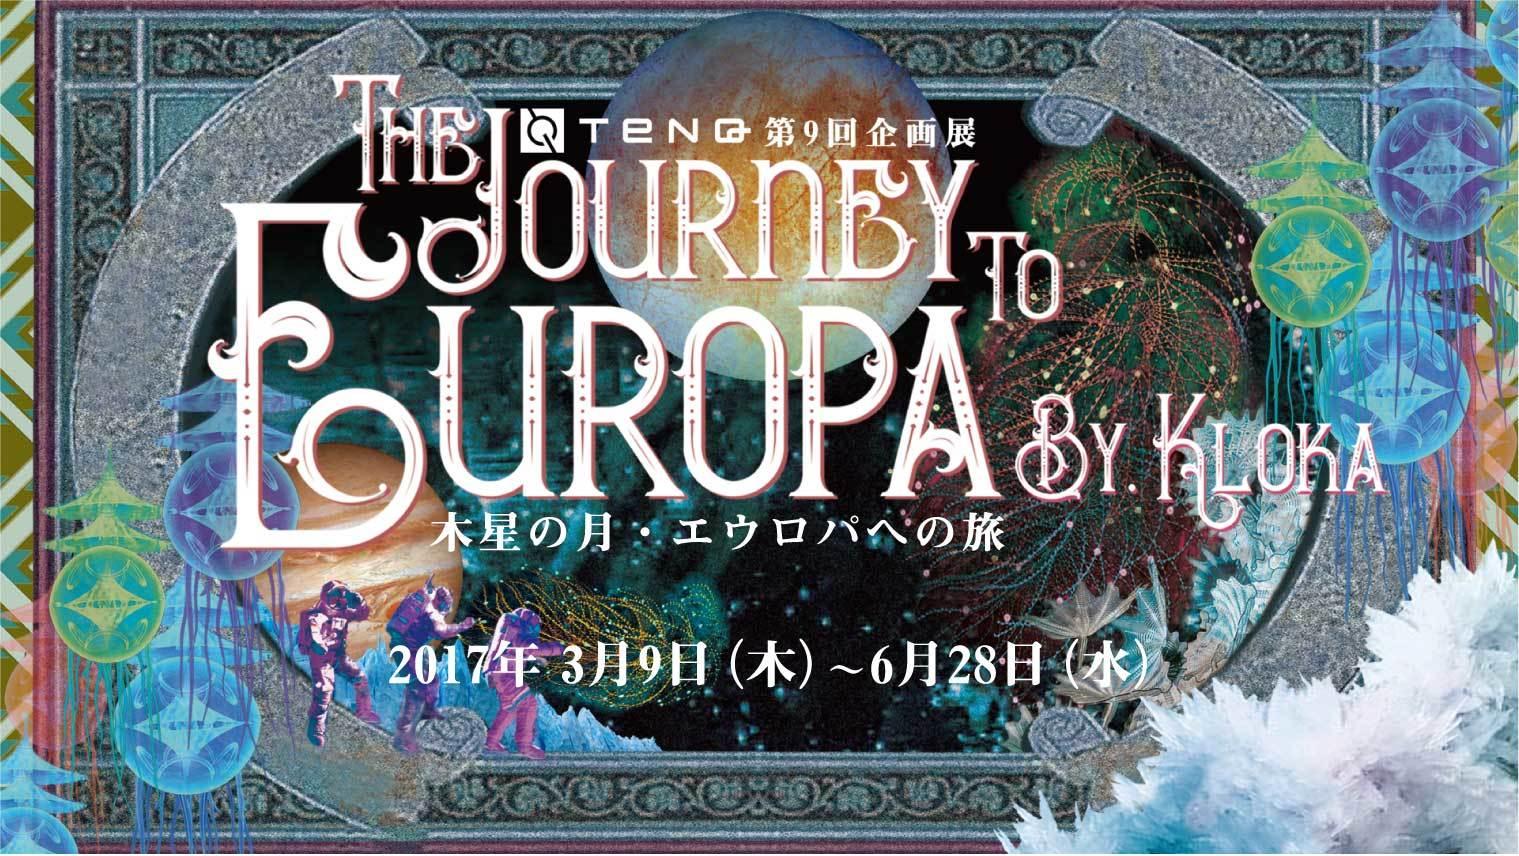 THE Journey to EUROPA by KLOKA~木星の月・エウロパへの旅~